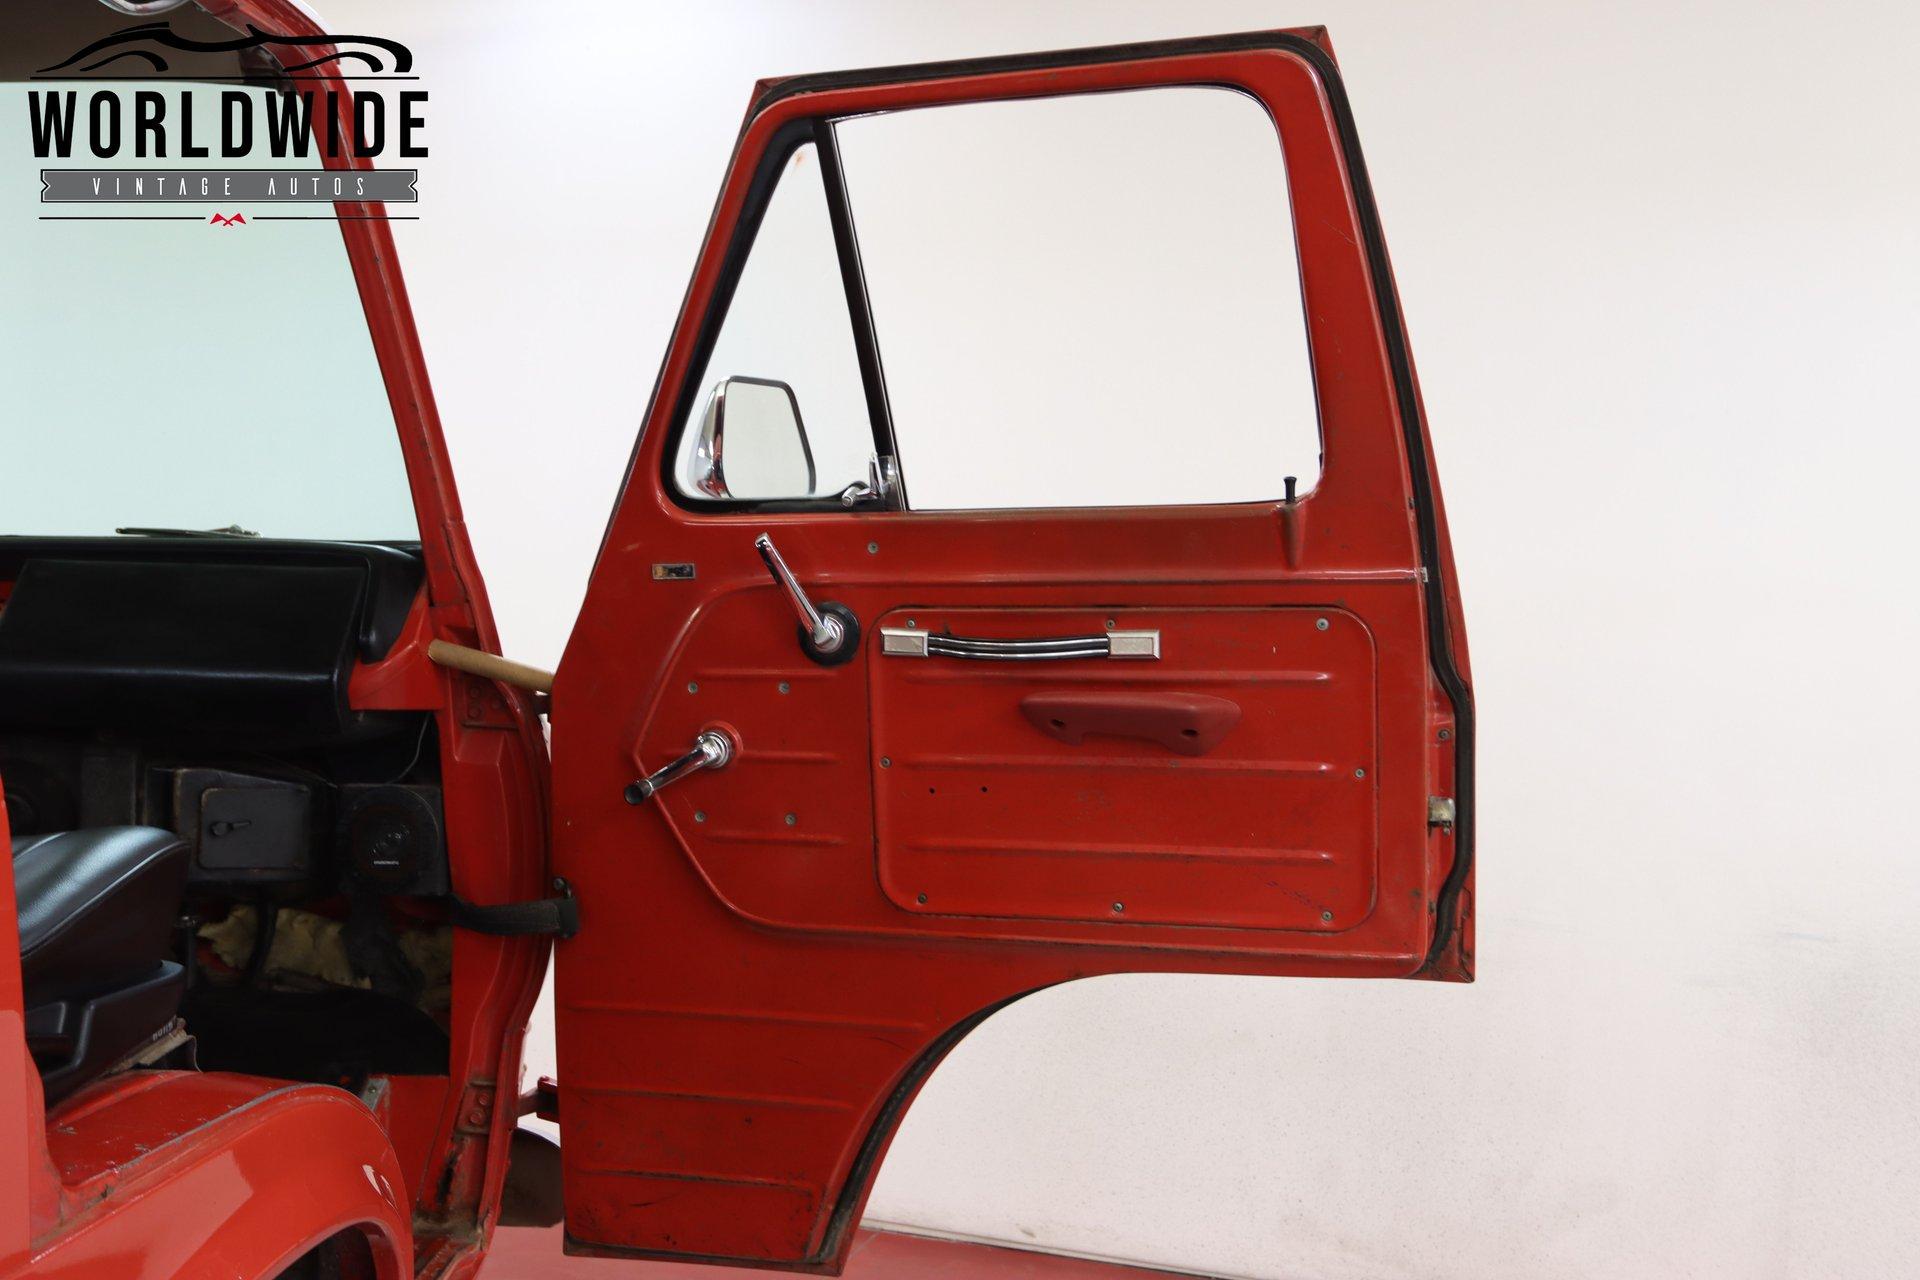 1966 Ford Econoline